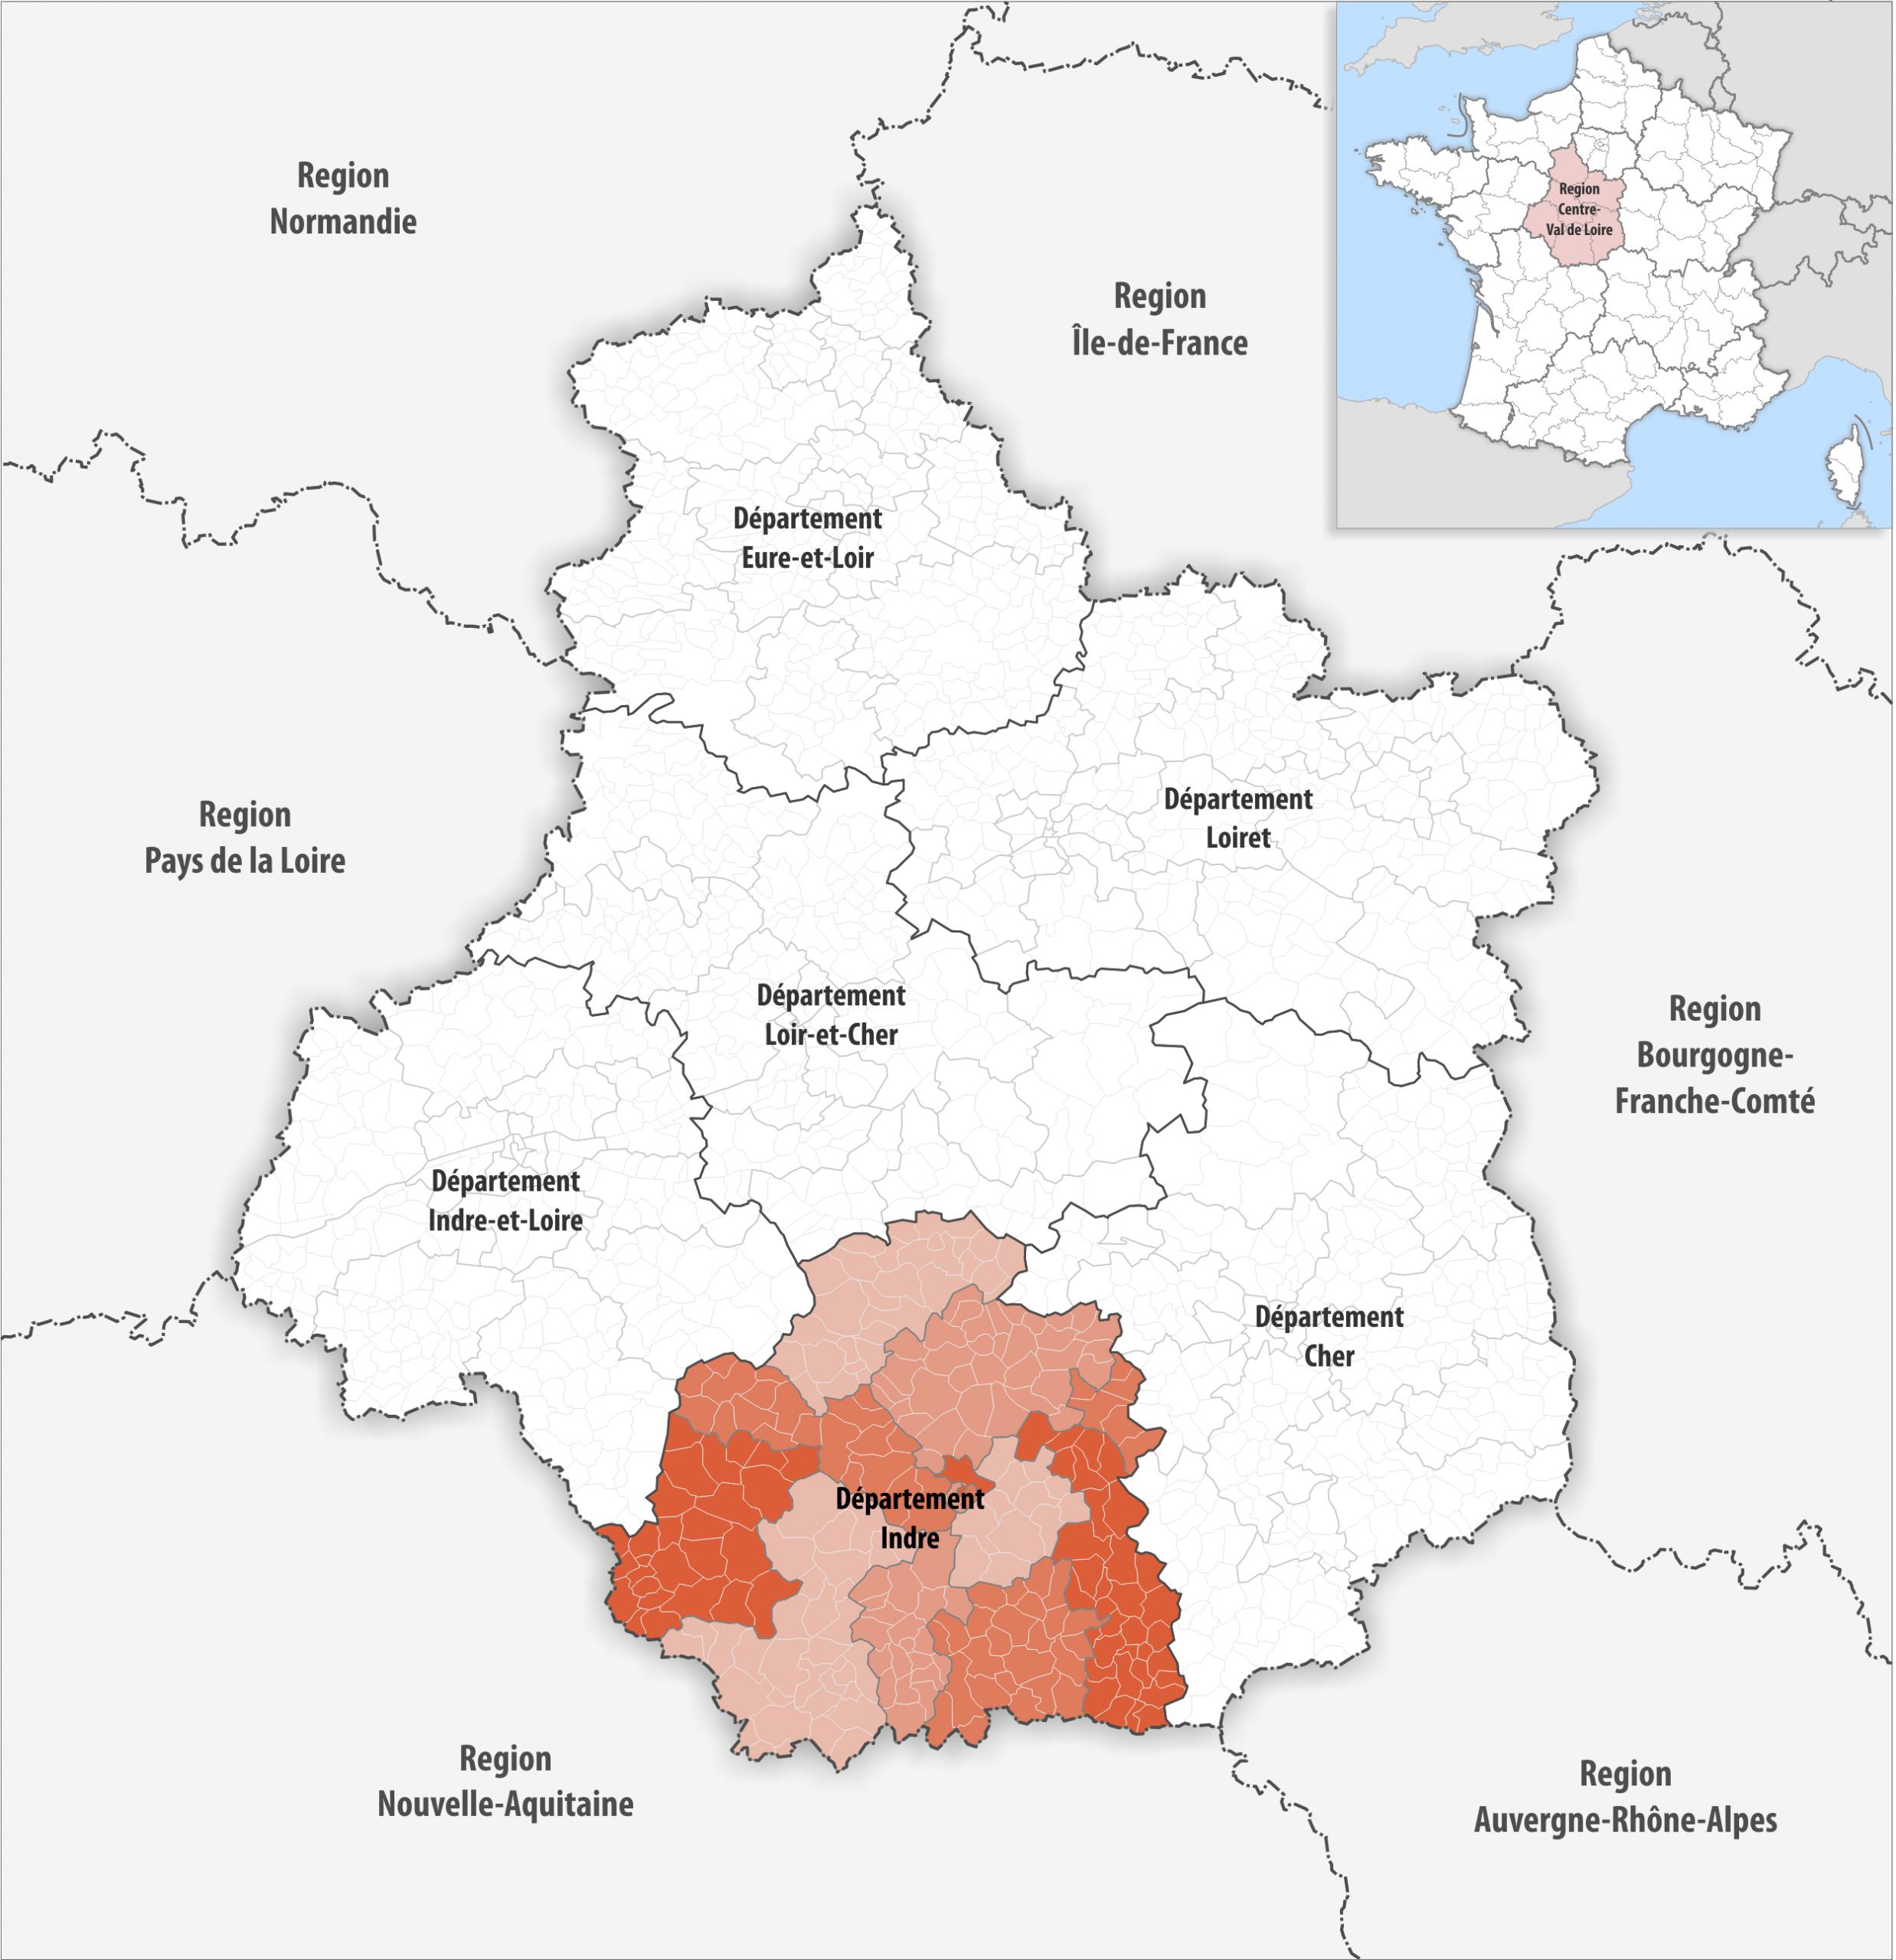 File:locator Map Of Departement Indre 2018 - Wikimedia encequiconcerne Departement 22 Region